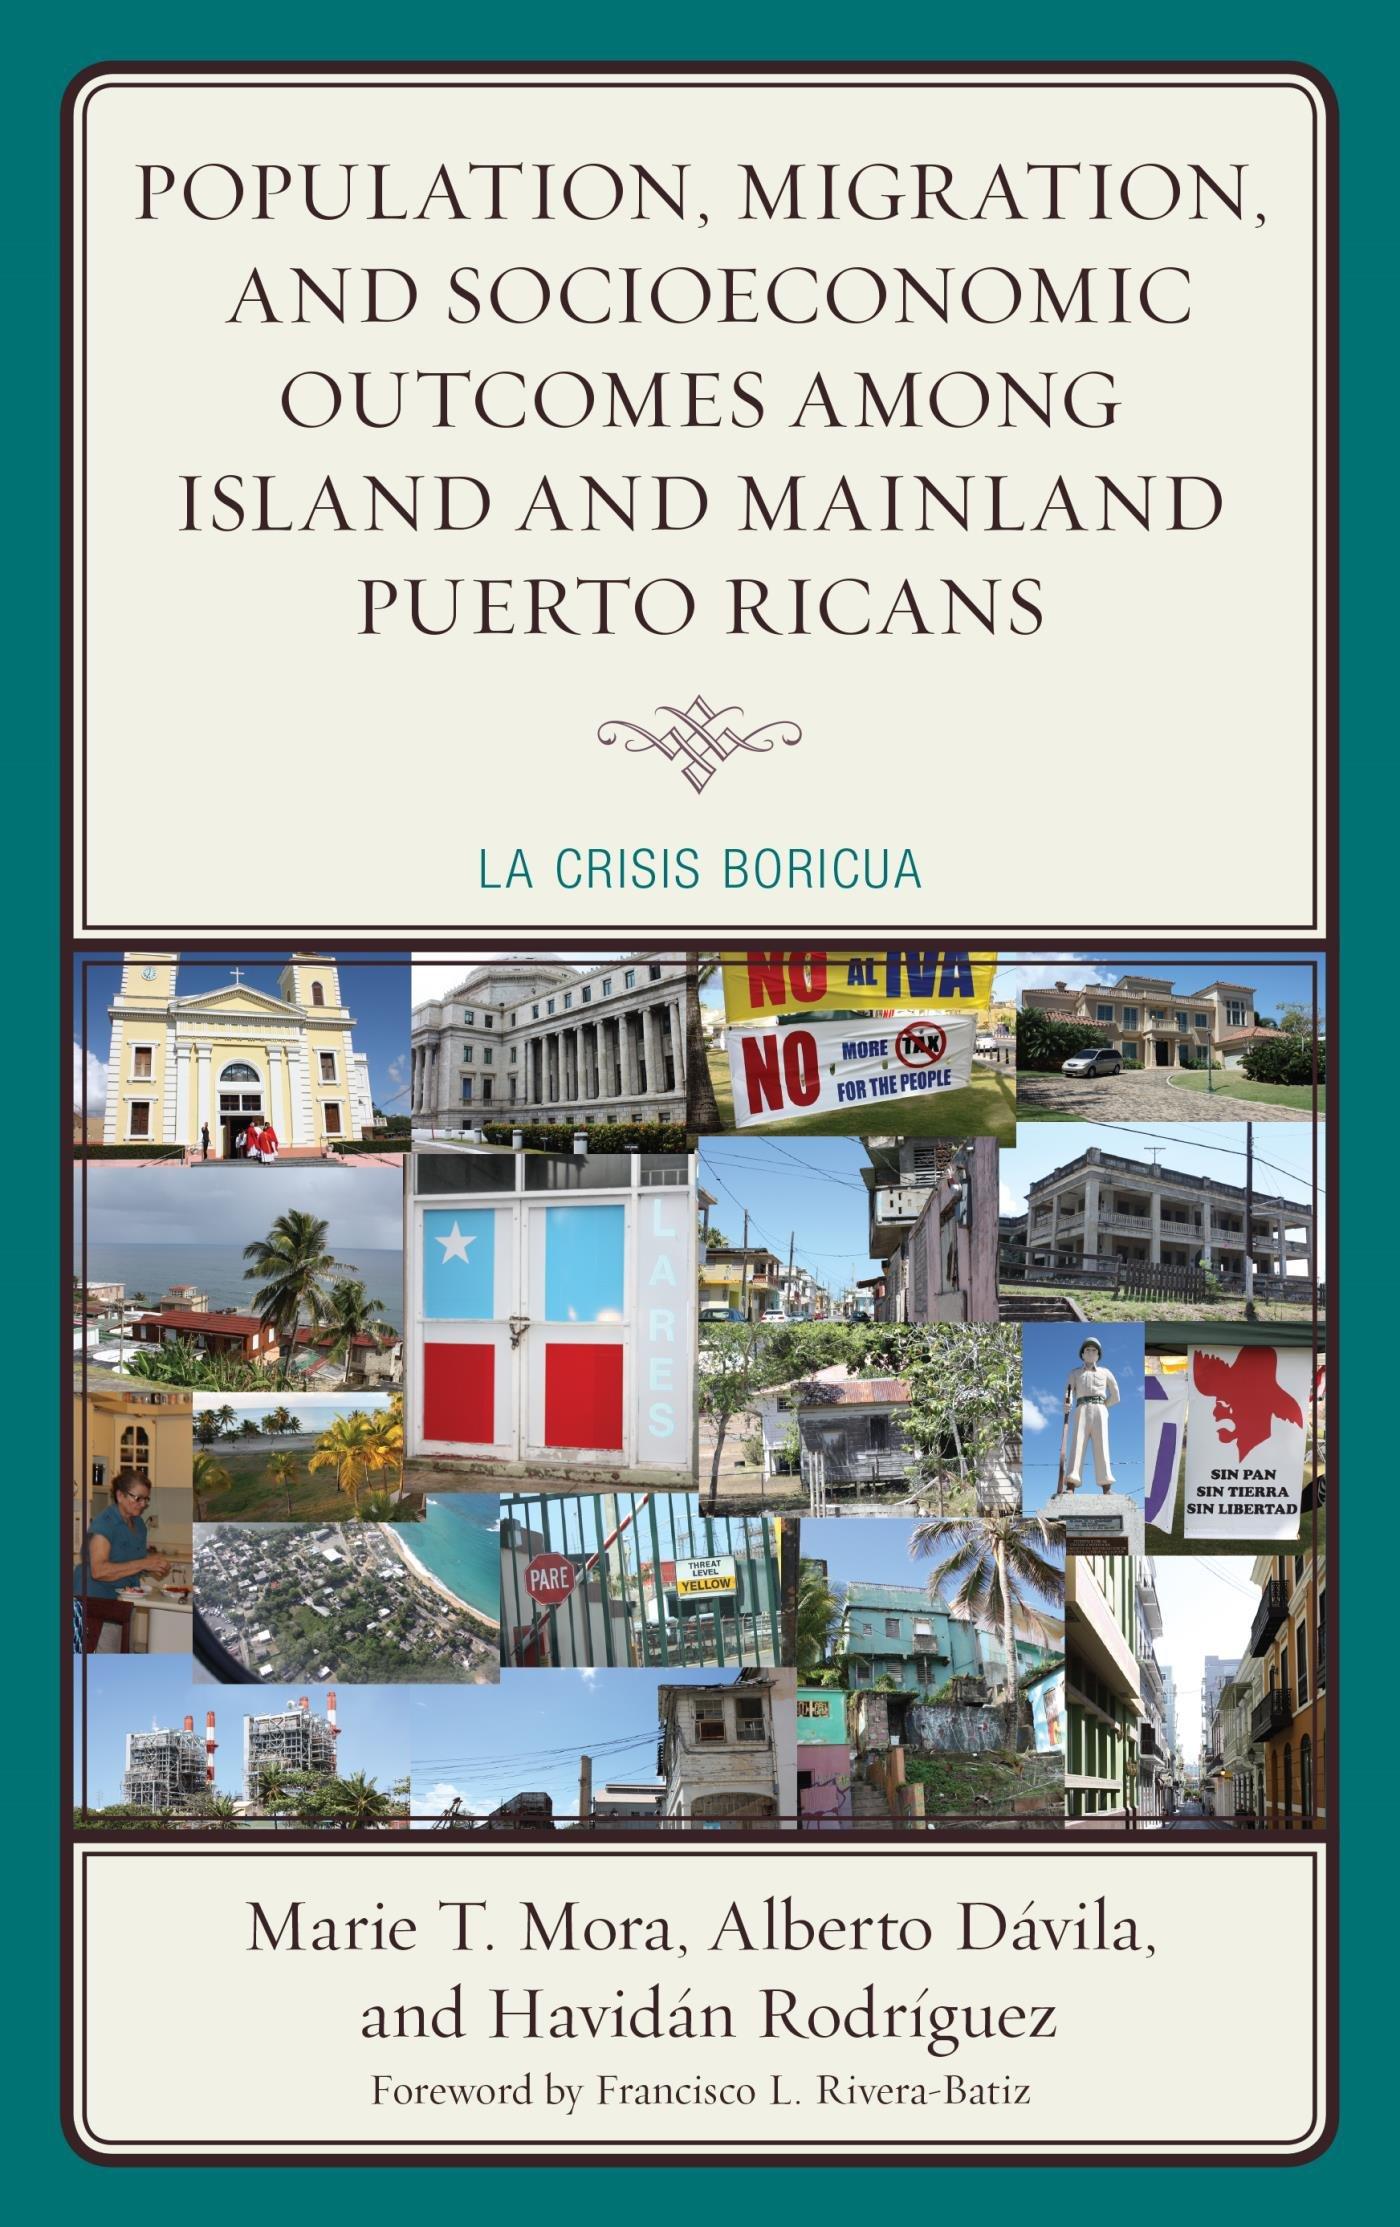 Population, Migration, and Socioeconomic Outcomes among Island and Mainland Puerto Ricans: La Crisis Boricua